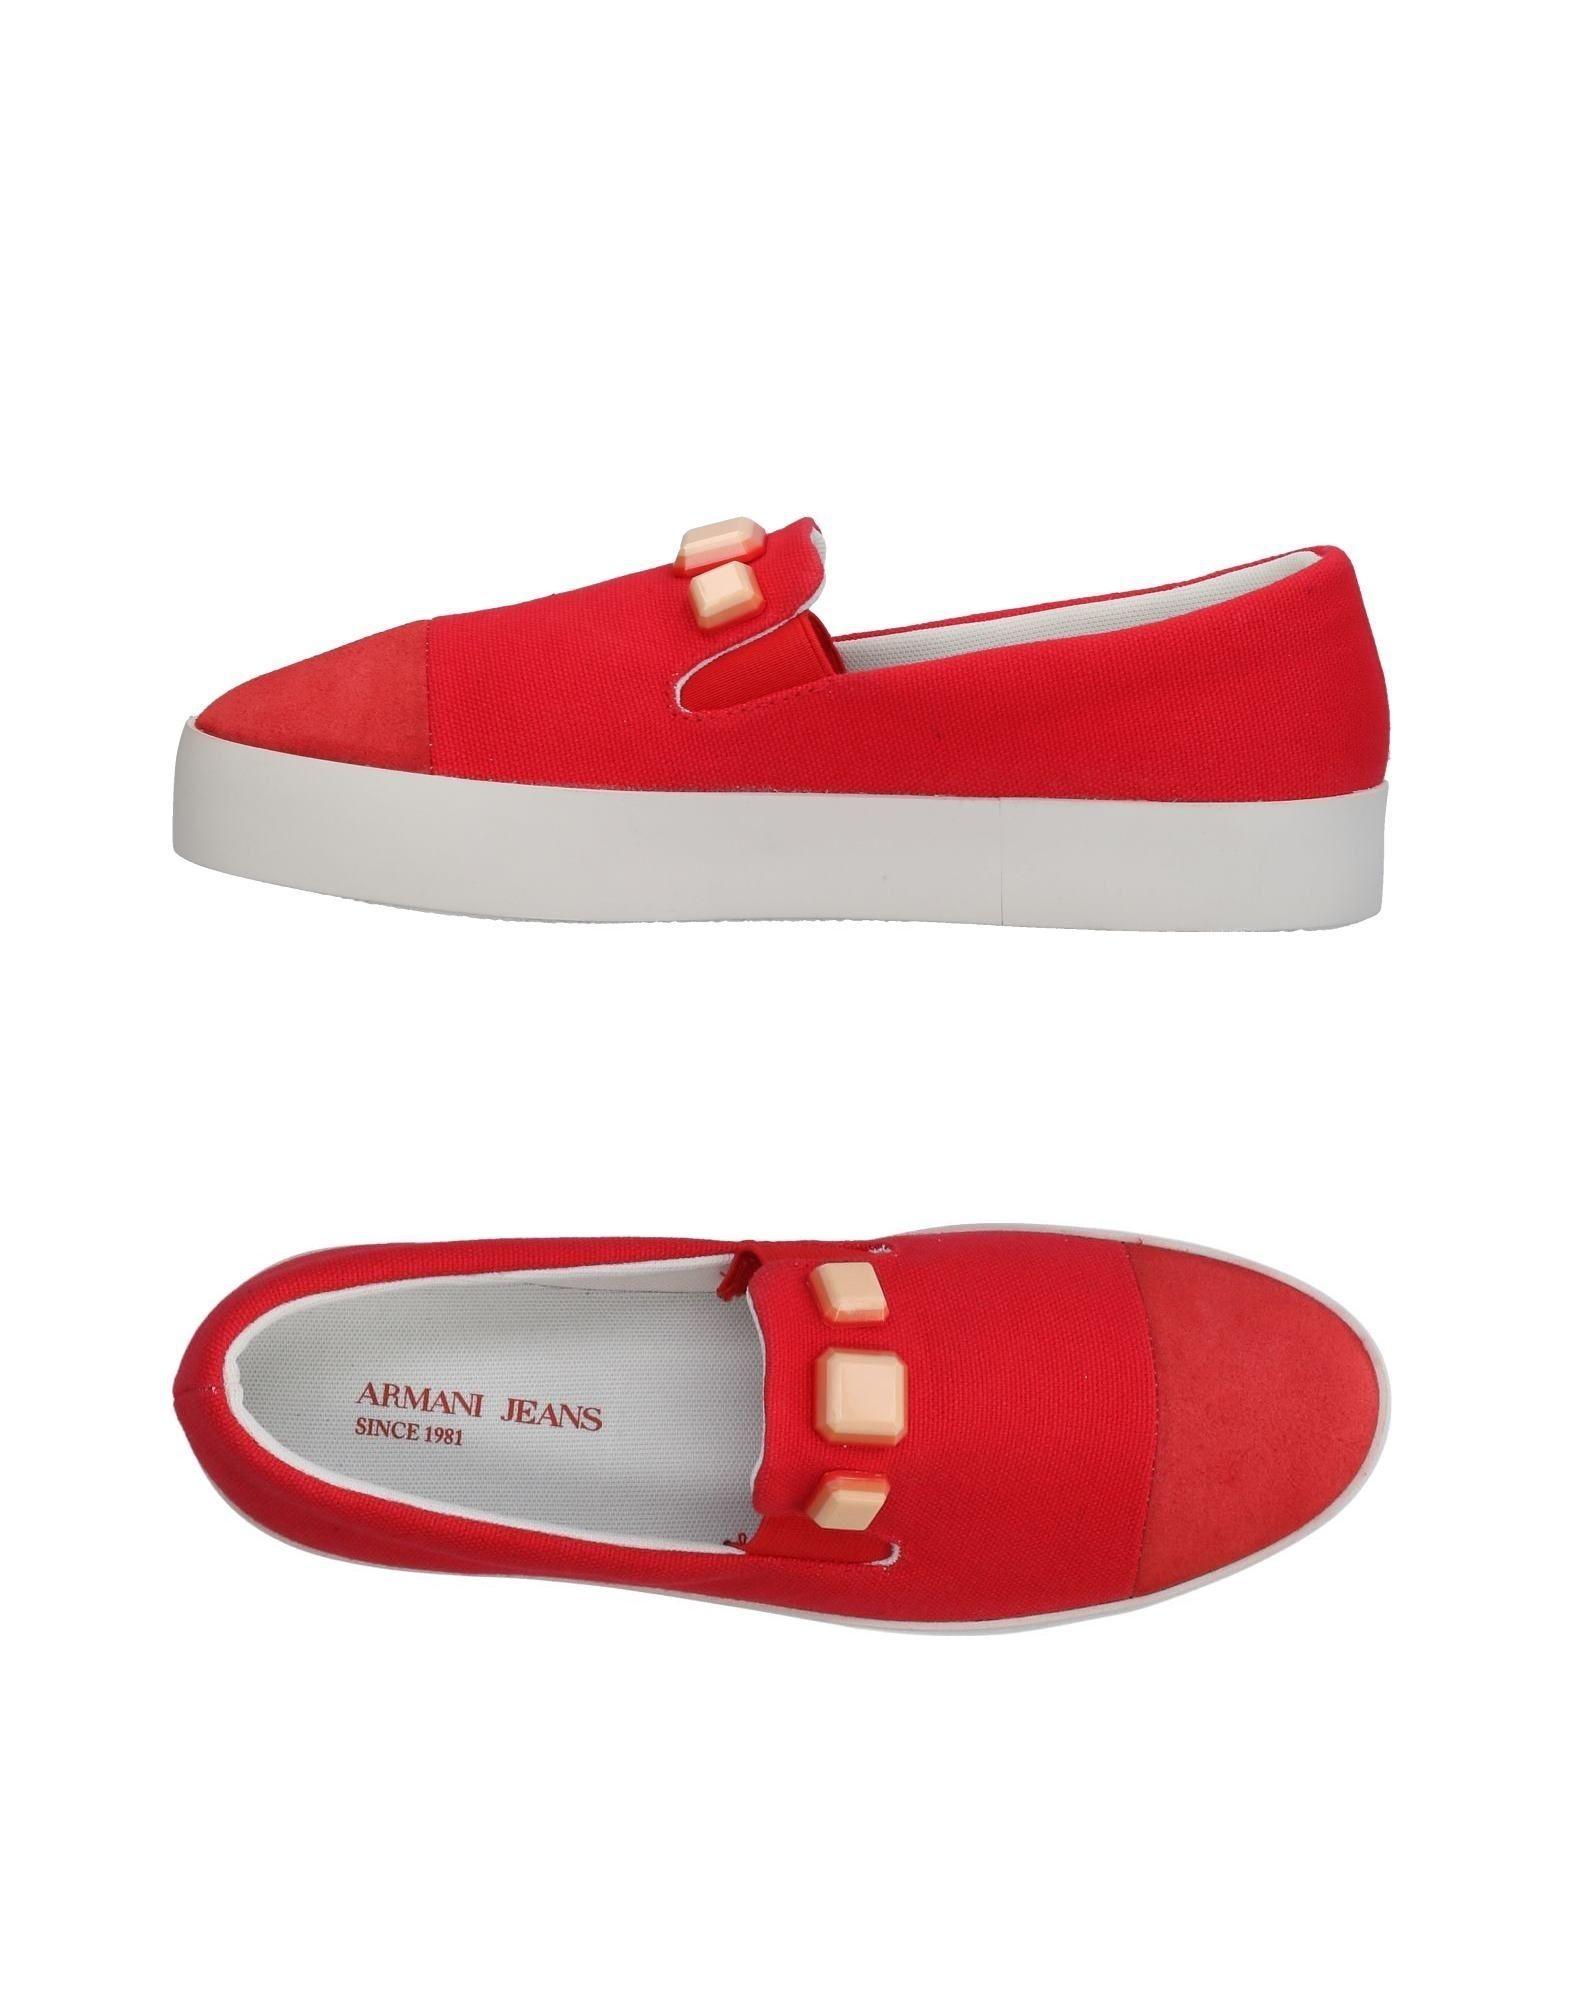 Armani Jeans Sneakers Damen  11456372UT Gute Qualität beliebte Schuhe